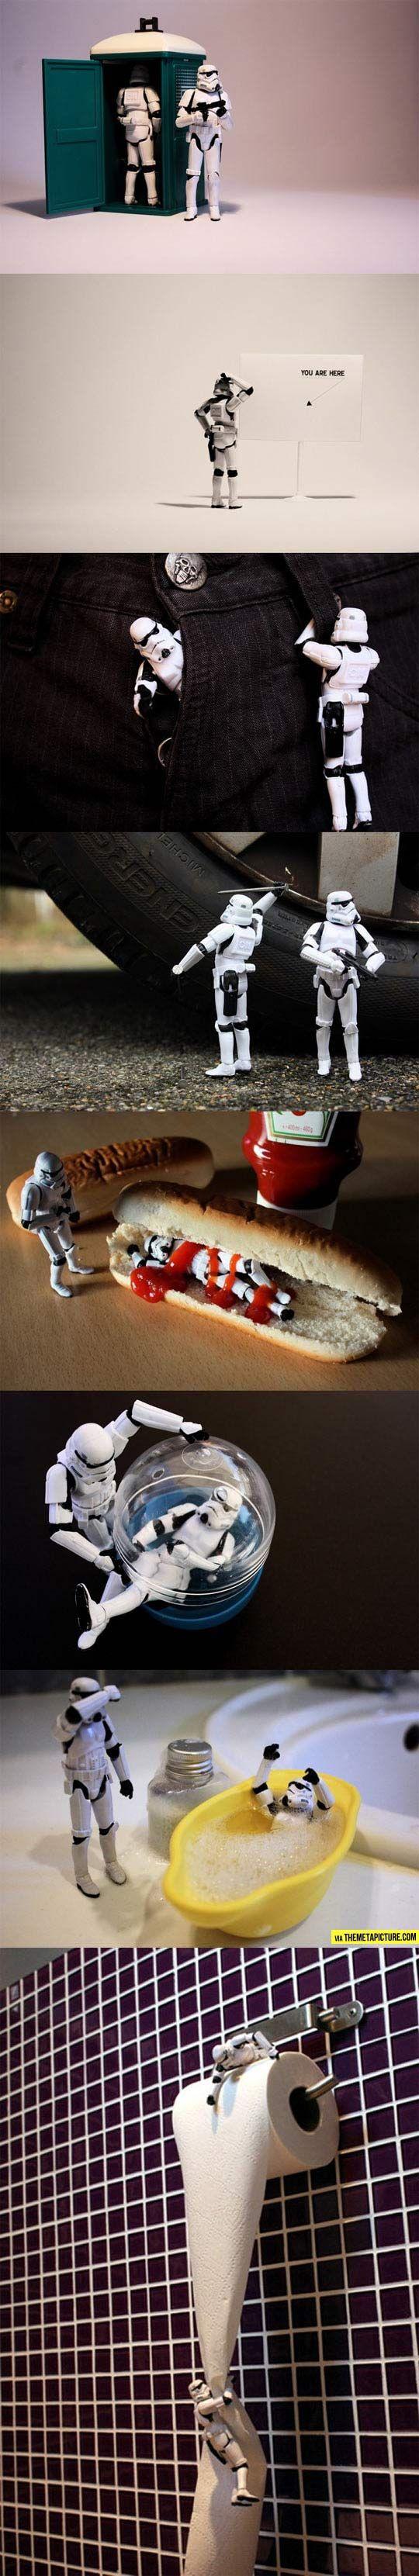 funny-Stormtrooper-day-life-Star-Wars-bathroom